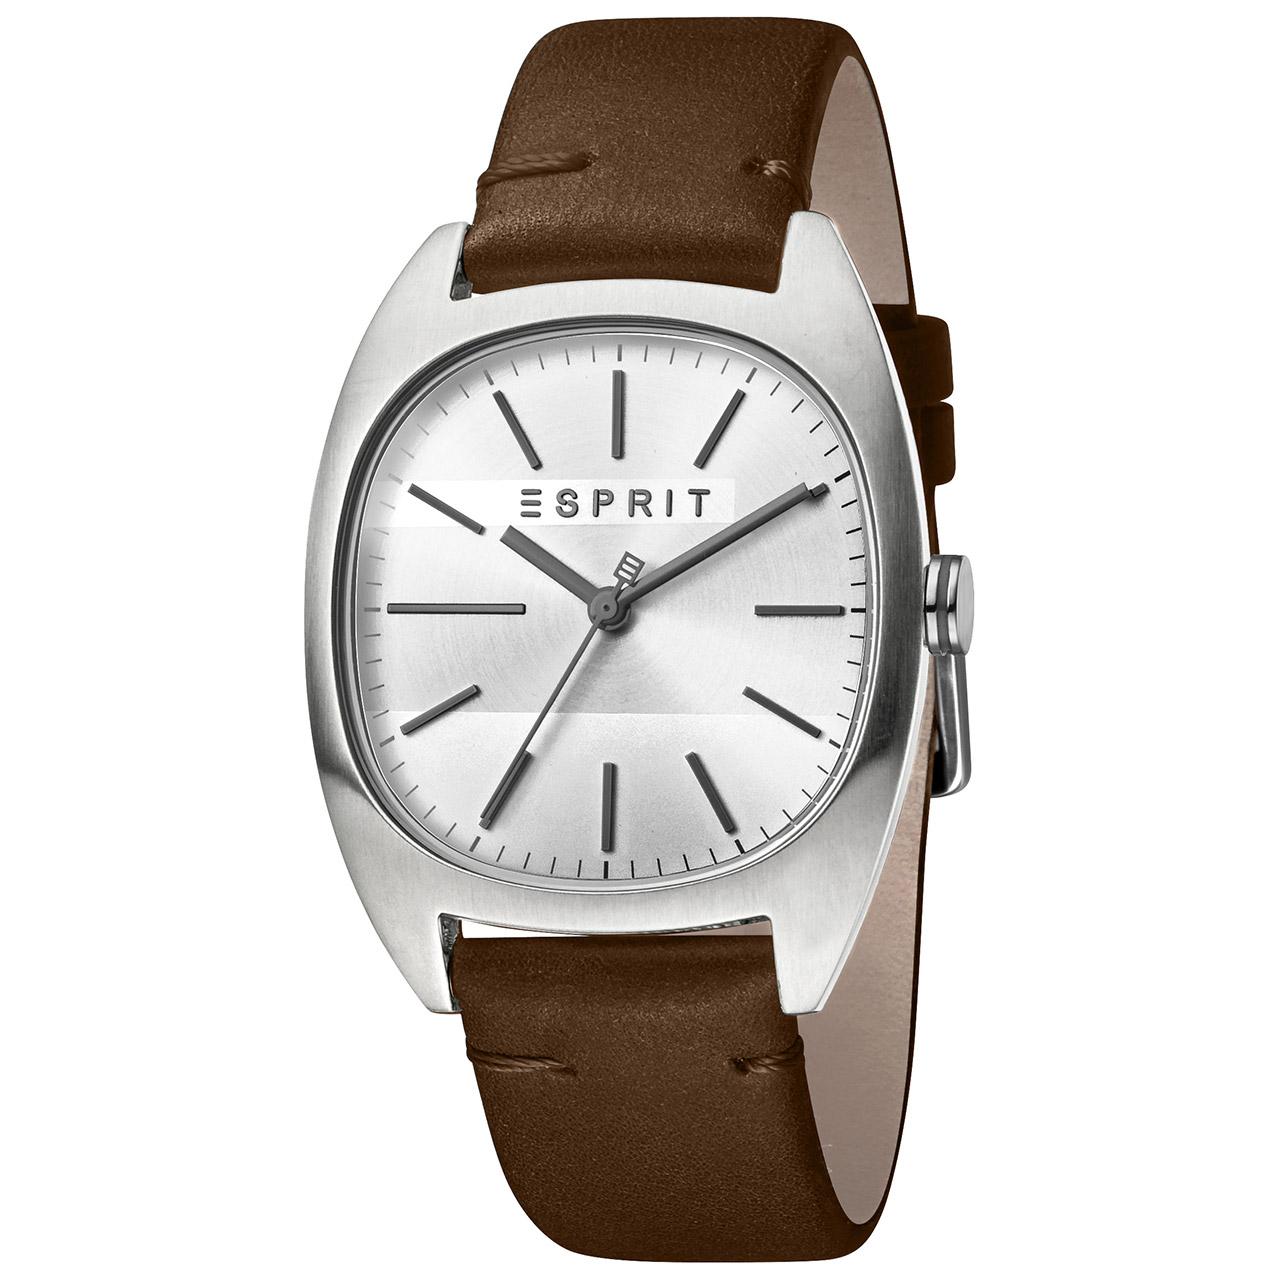 ساعت مچی عقربه ای مردانه اسپریت مدل ES1G038L0015 55